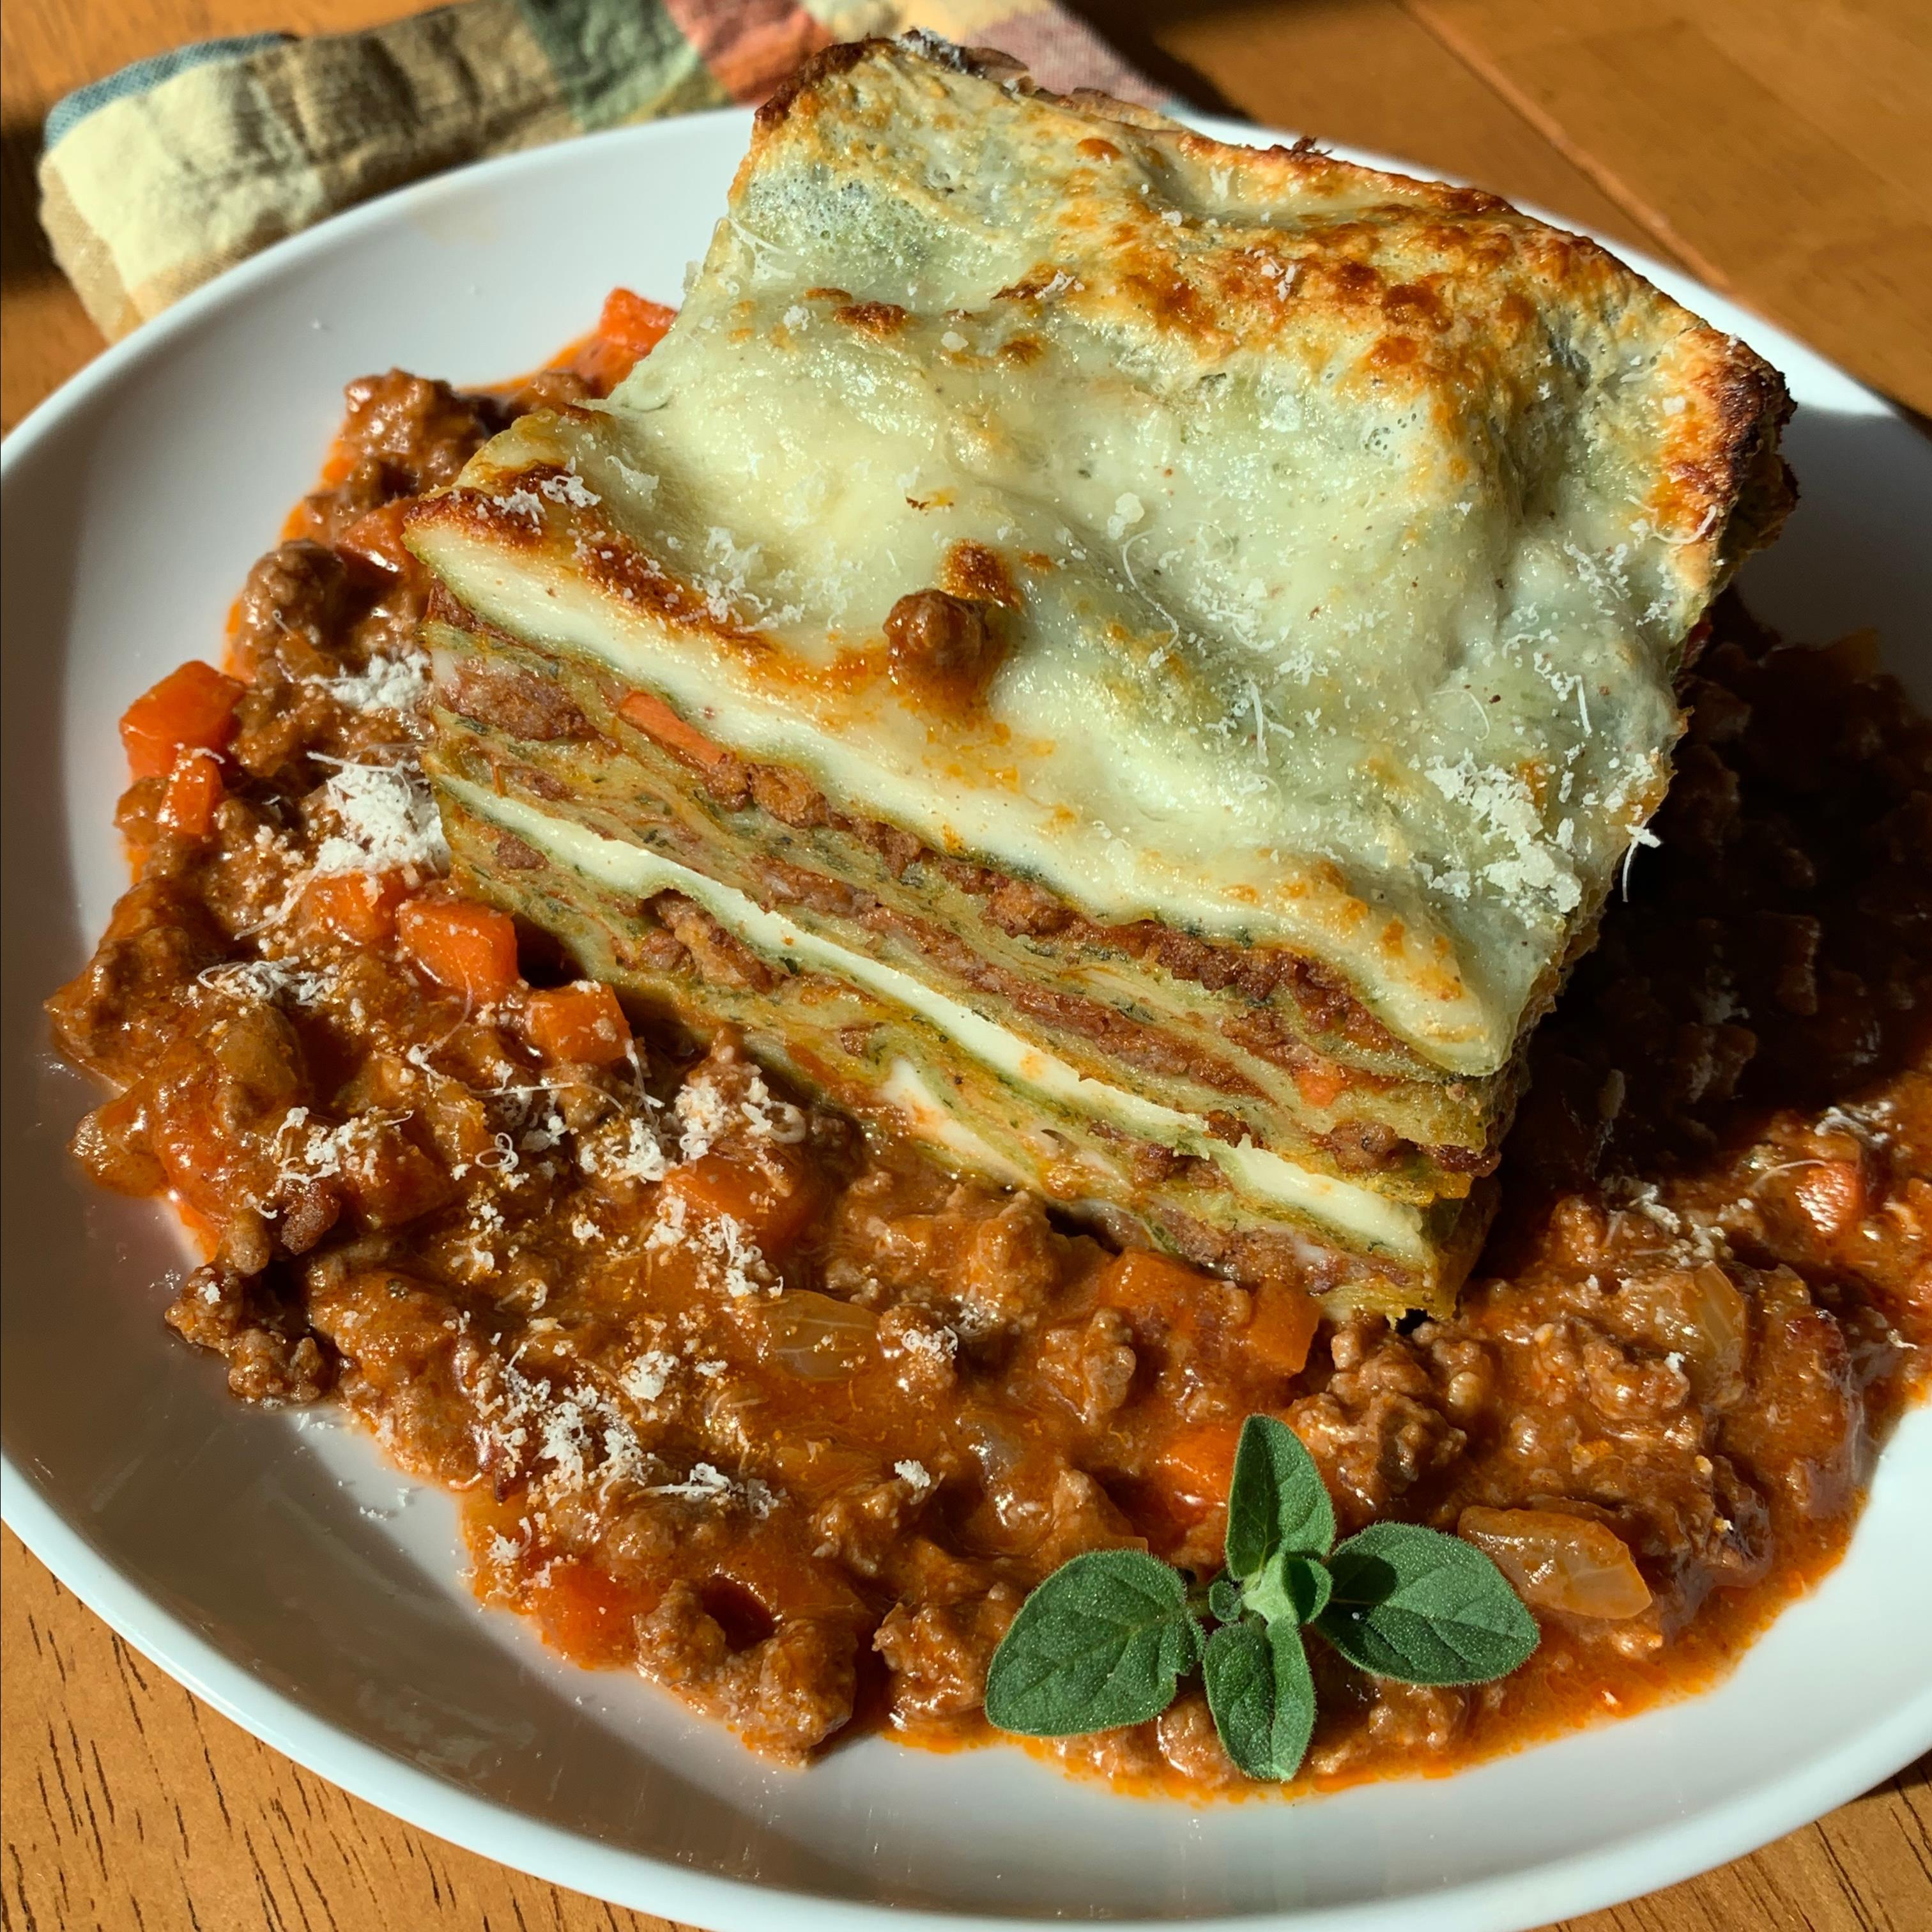 Ricetta Lasagne Verdi Alla Bolognese.Lasagne Verdi Alla Bolognese Recipe Allrecipes